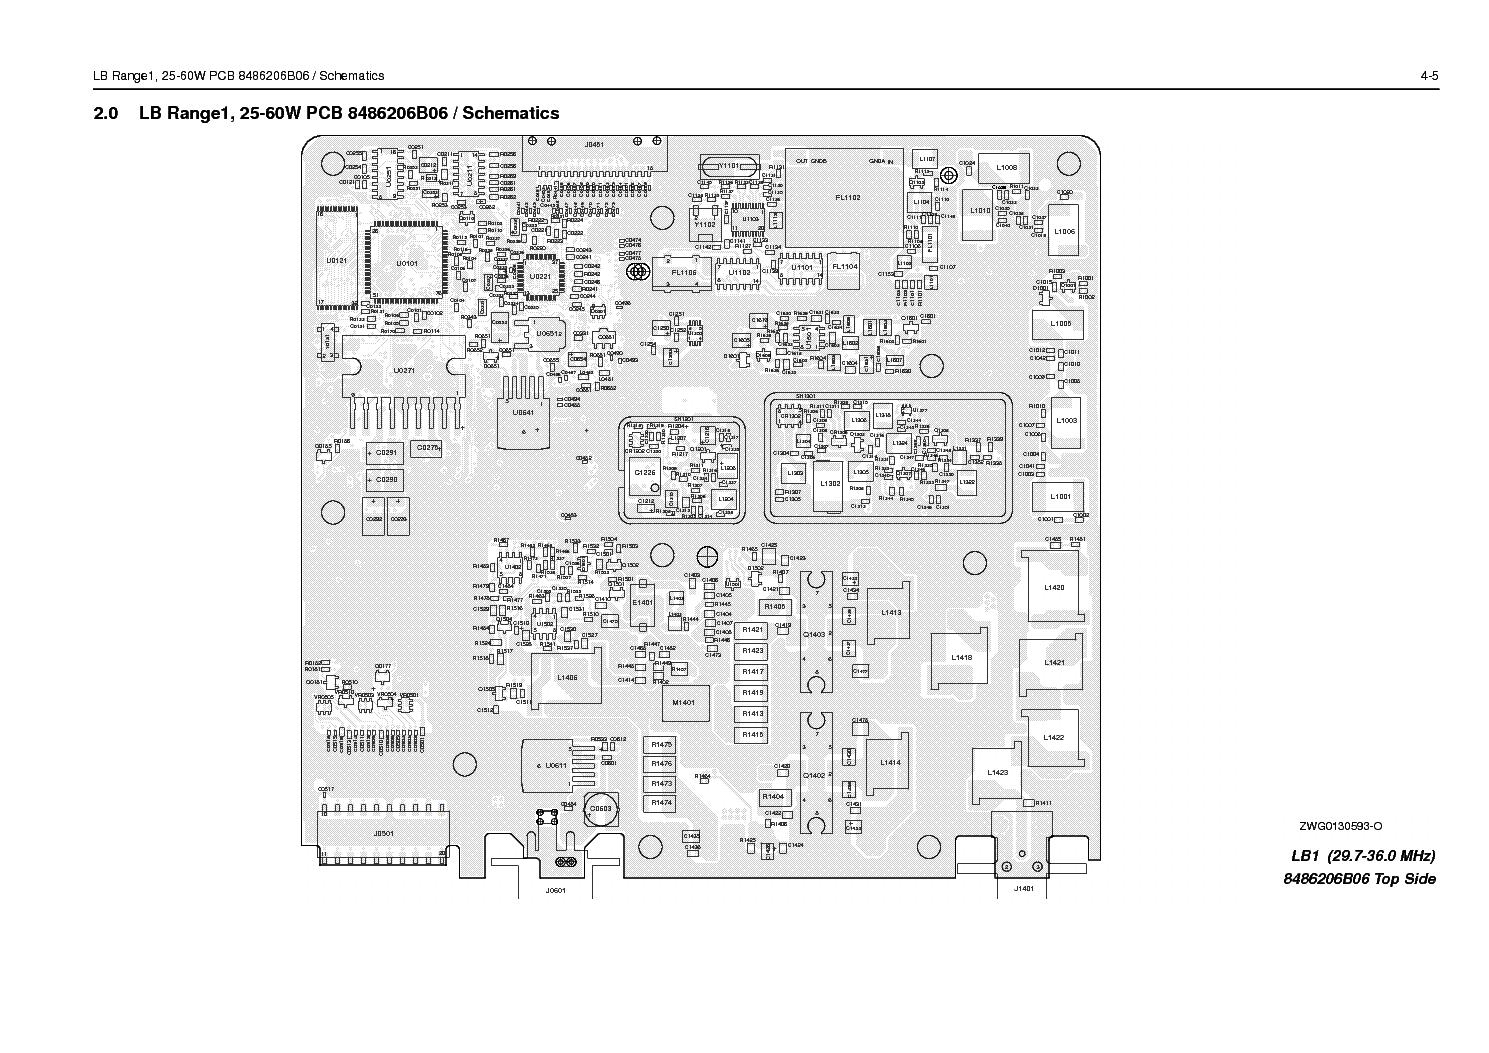 Motorola Mt1000 Service Manual Cm300 Wiring Diagram Array Mt 1000 U2013 Manuals Library For Free Rh 4free Articles Com